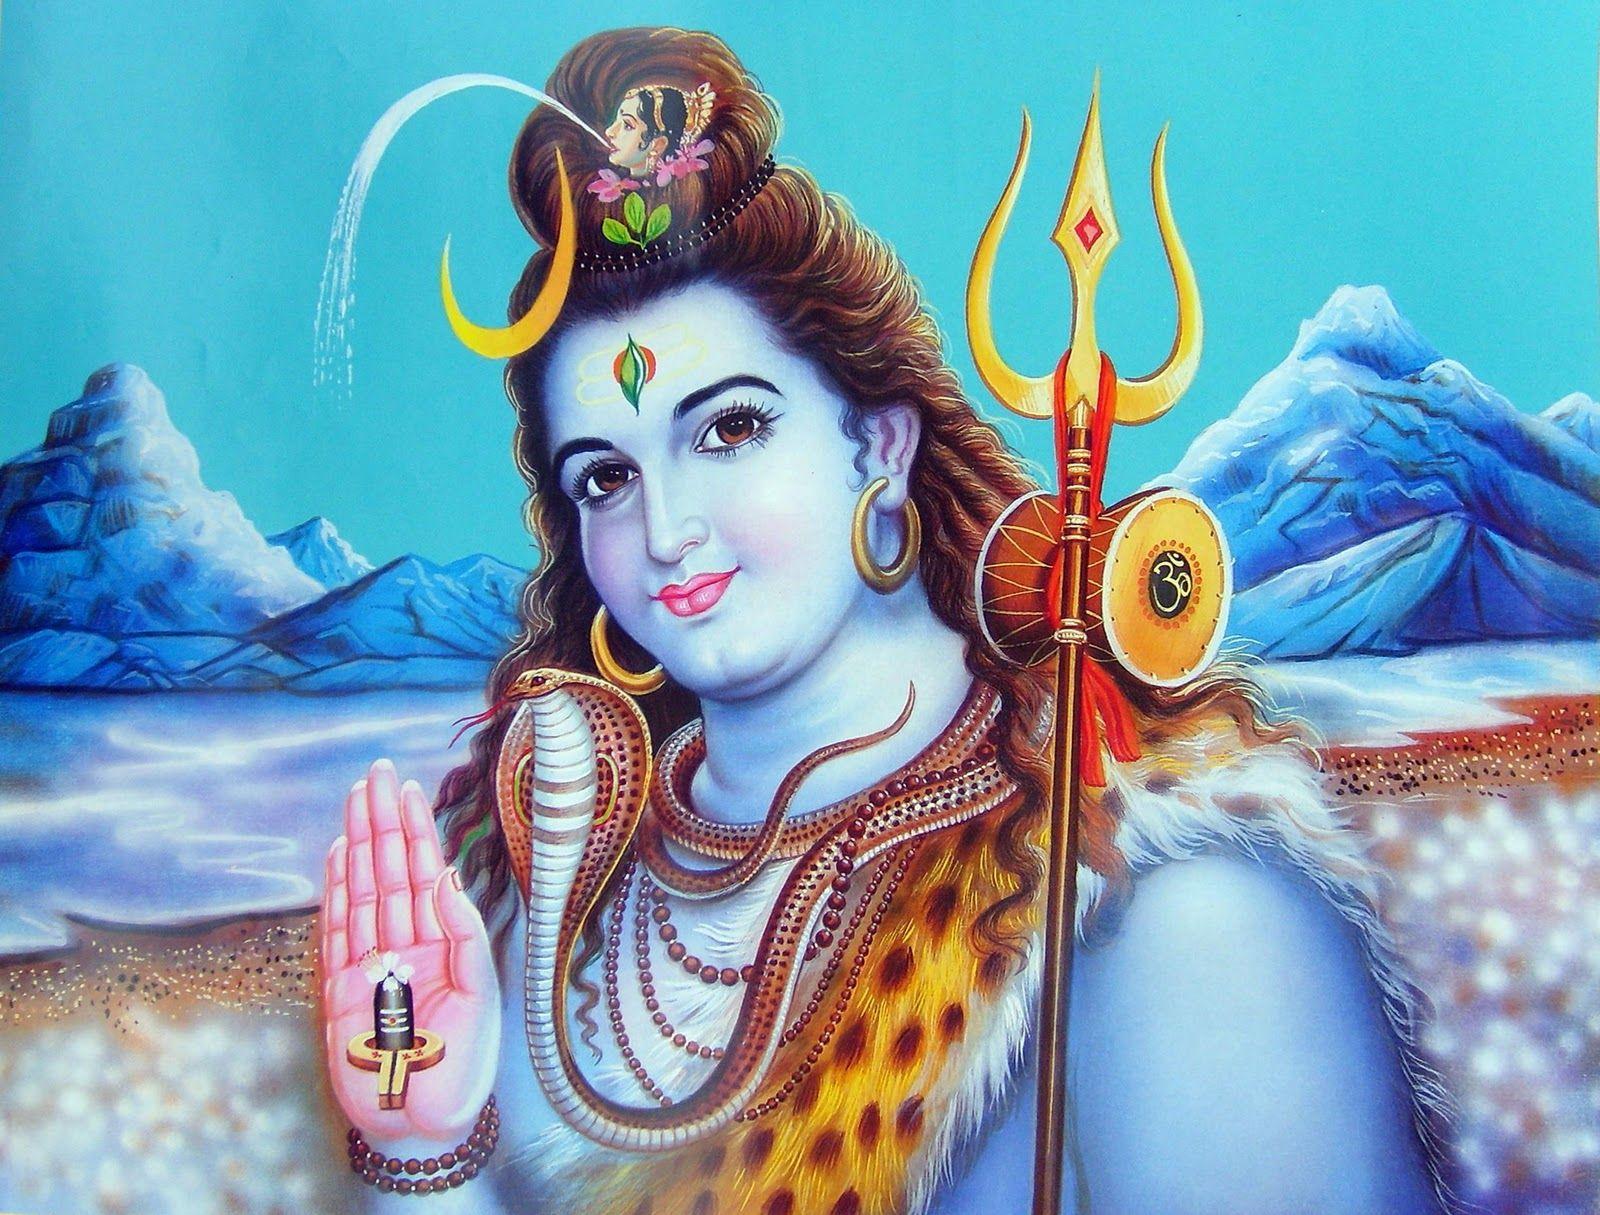 Bholenath Hd Wallpaper: Download Free Spiritual HD